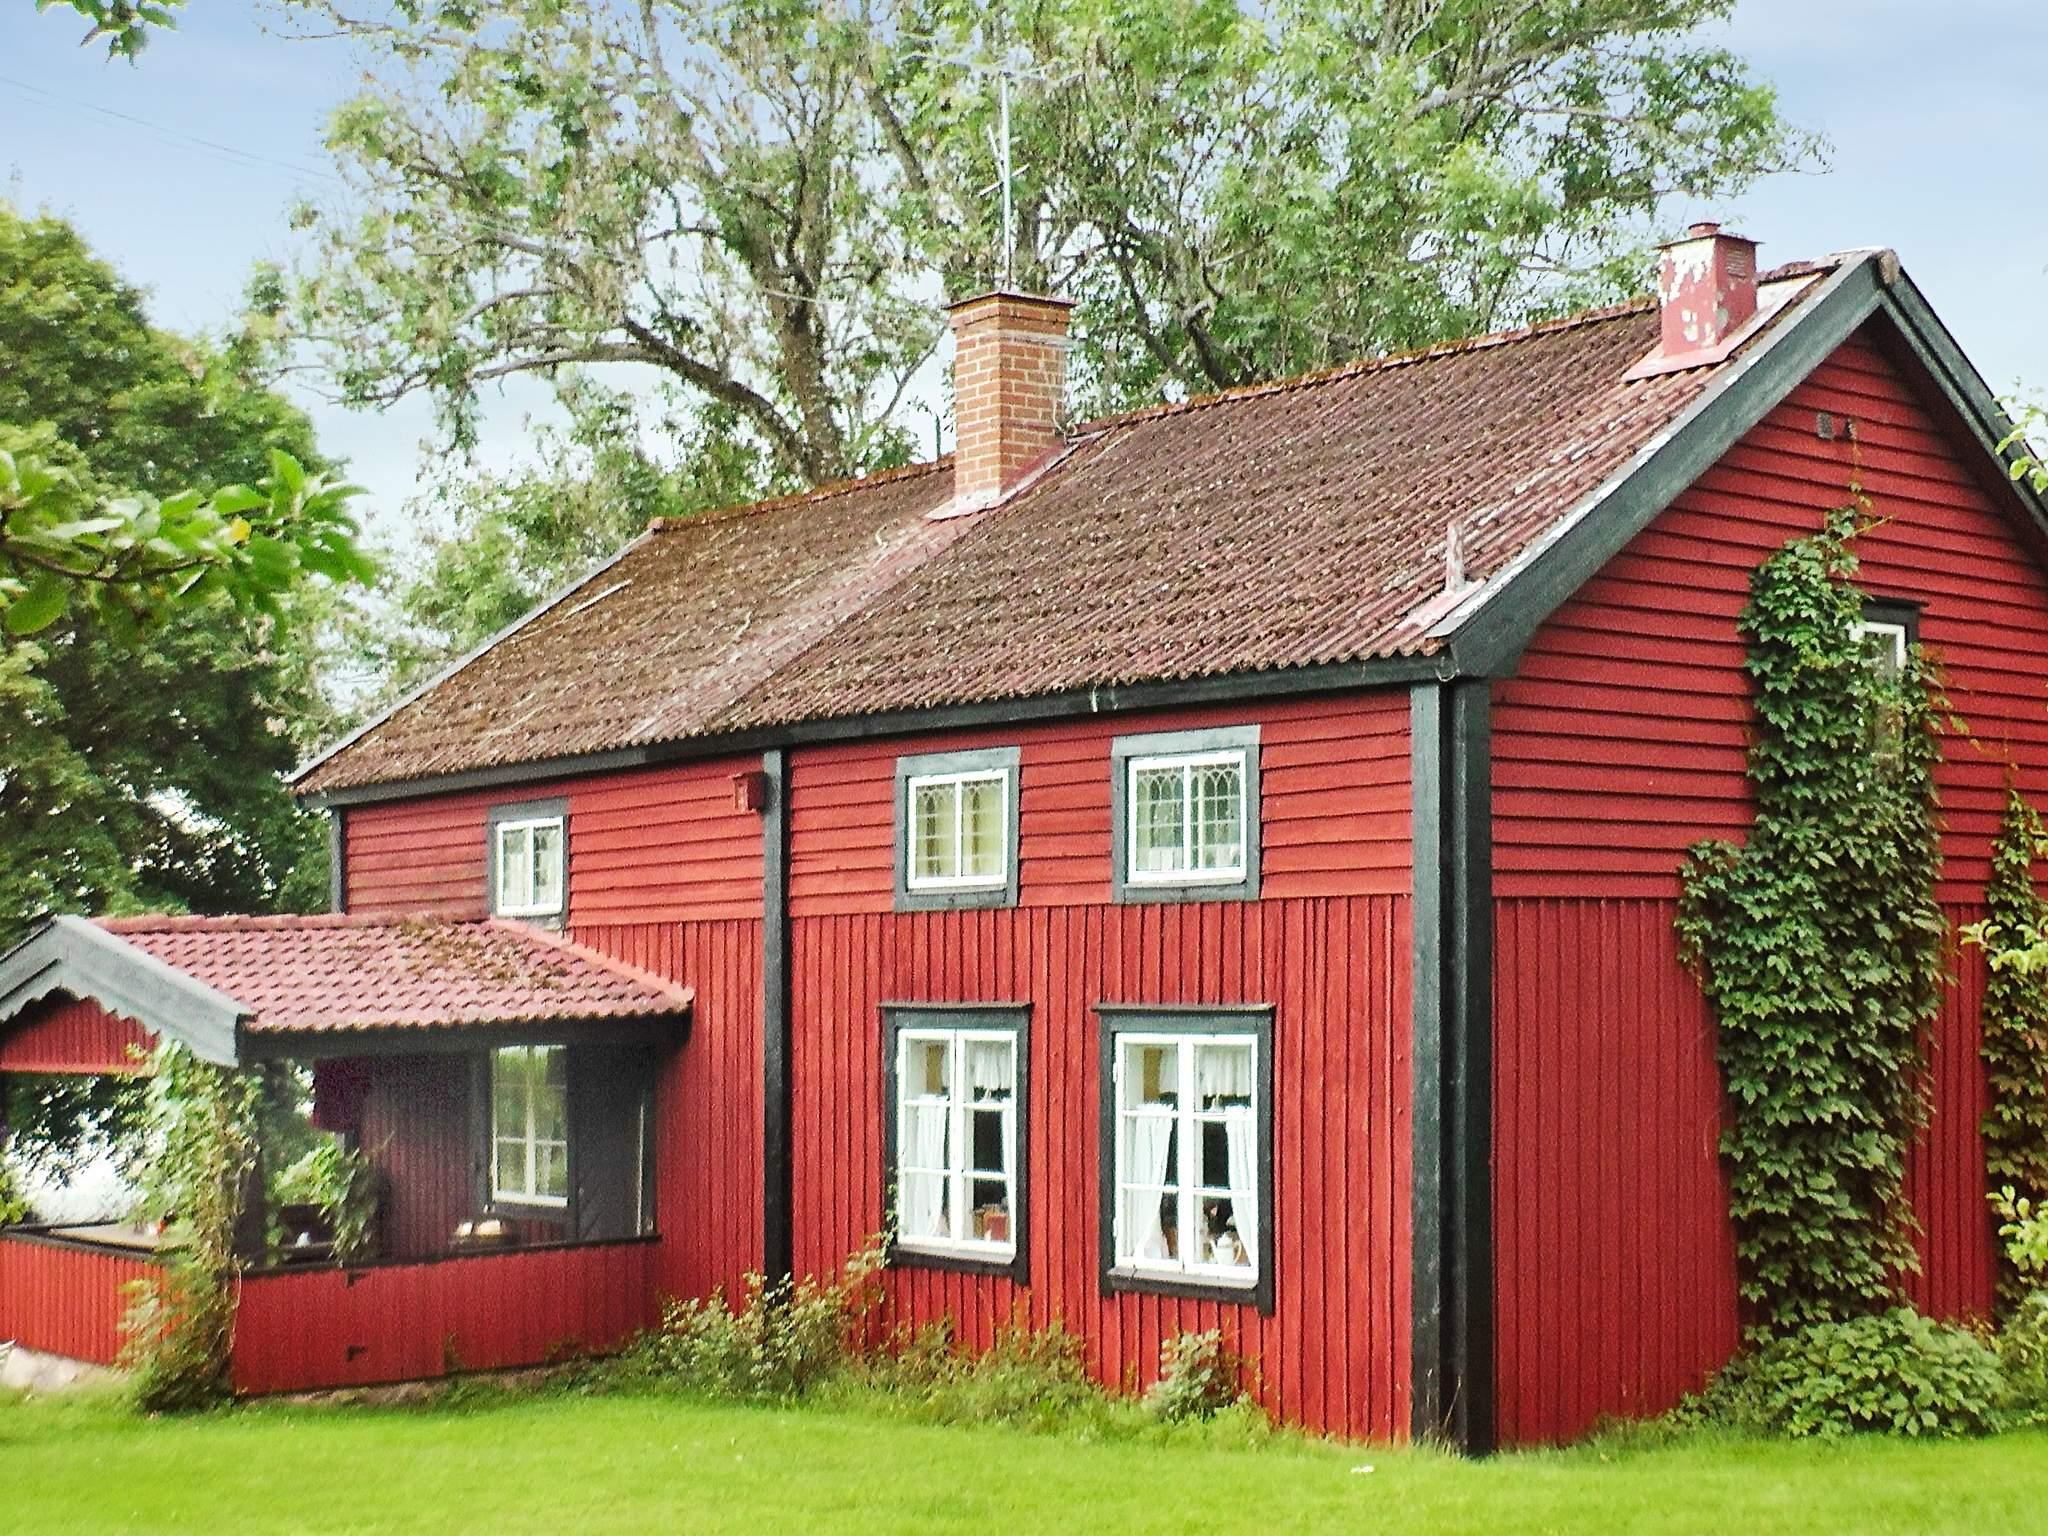 Ferienhaus Väddö (85466), Väddö, Region Stockholm, Mittelschweden, Schweden, Bild 11